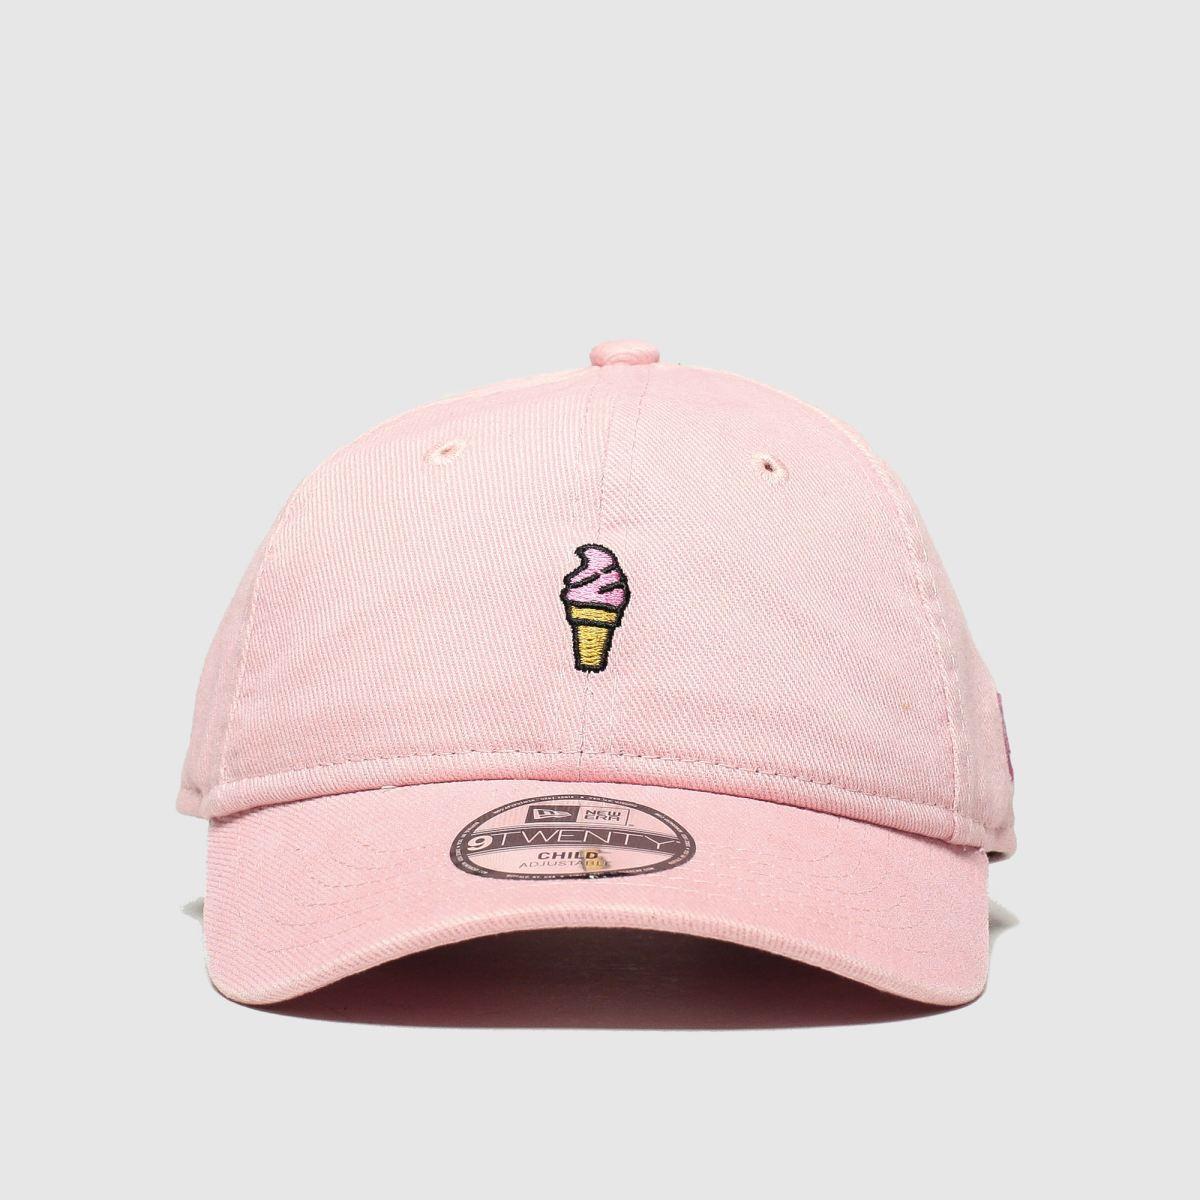 New Era Accessories New Era Pale Pink Kids 9twenty Ice Cream